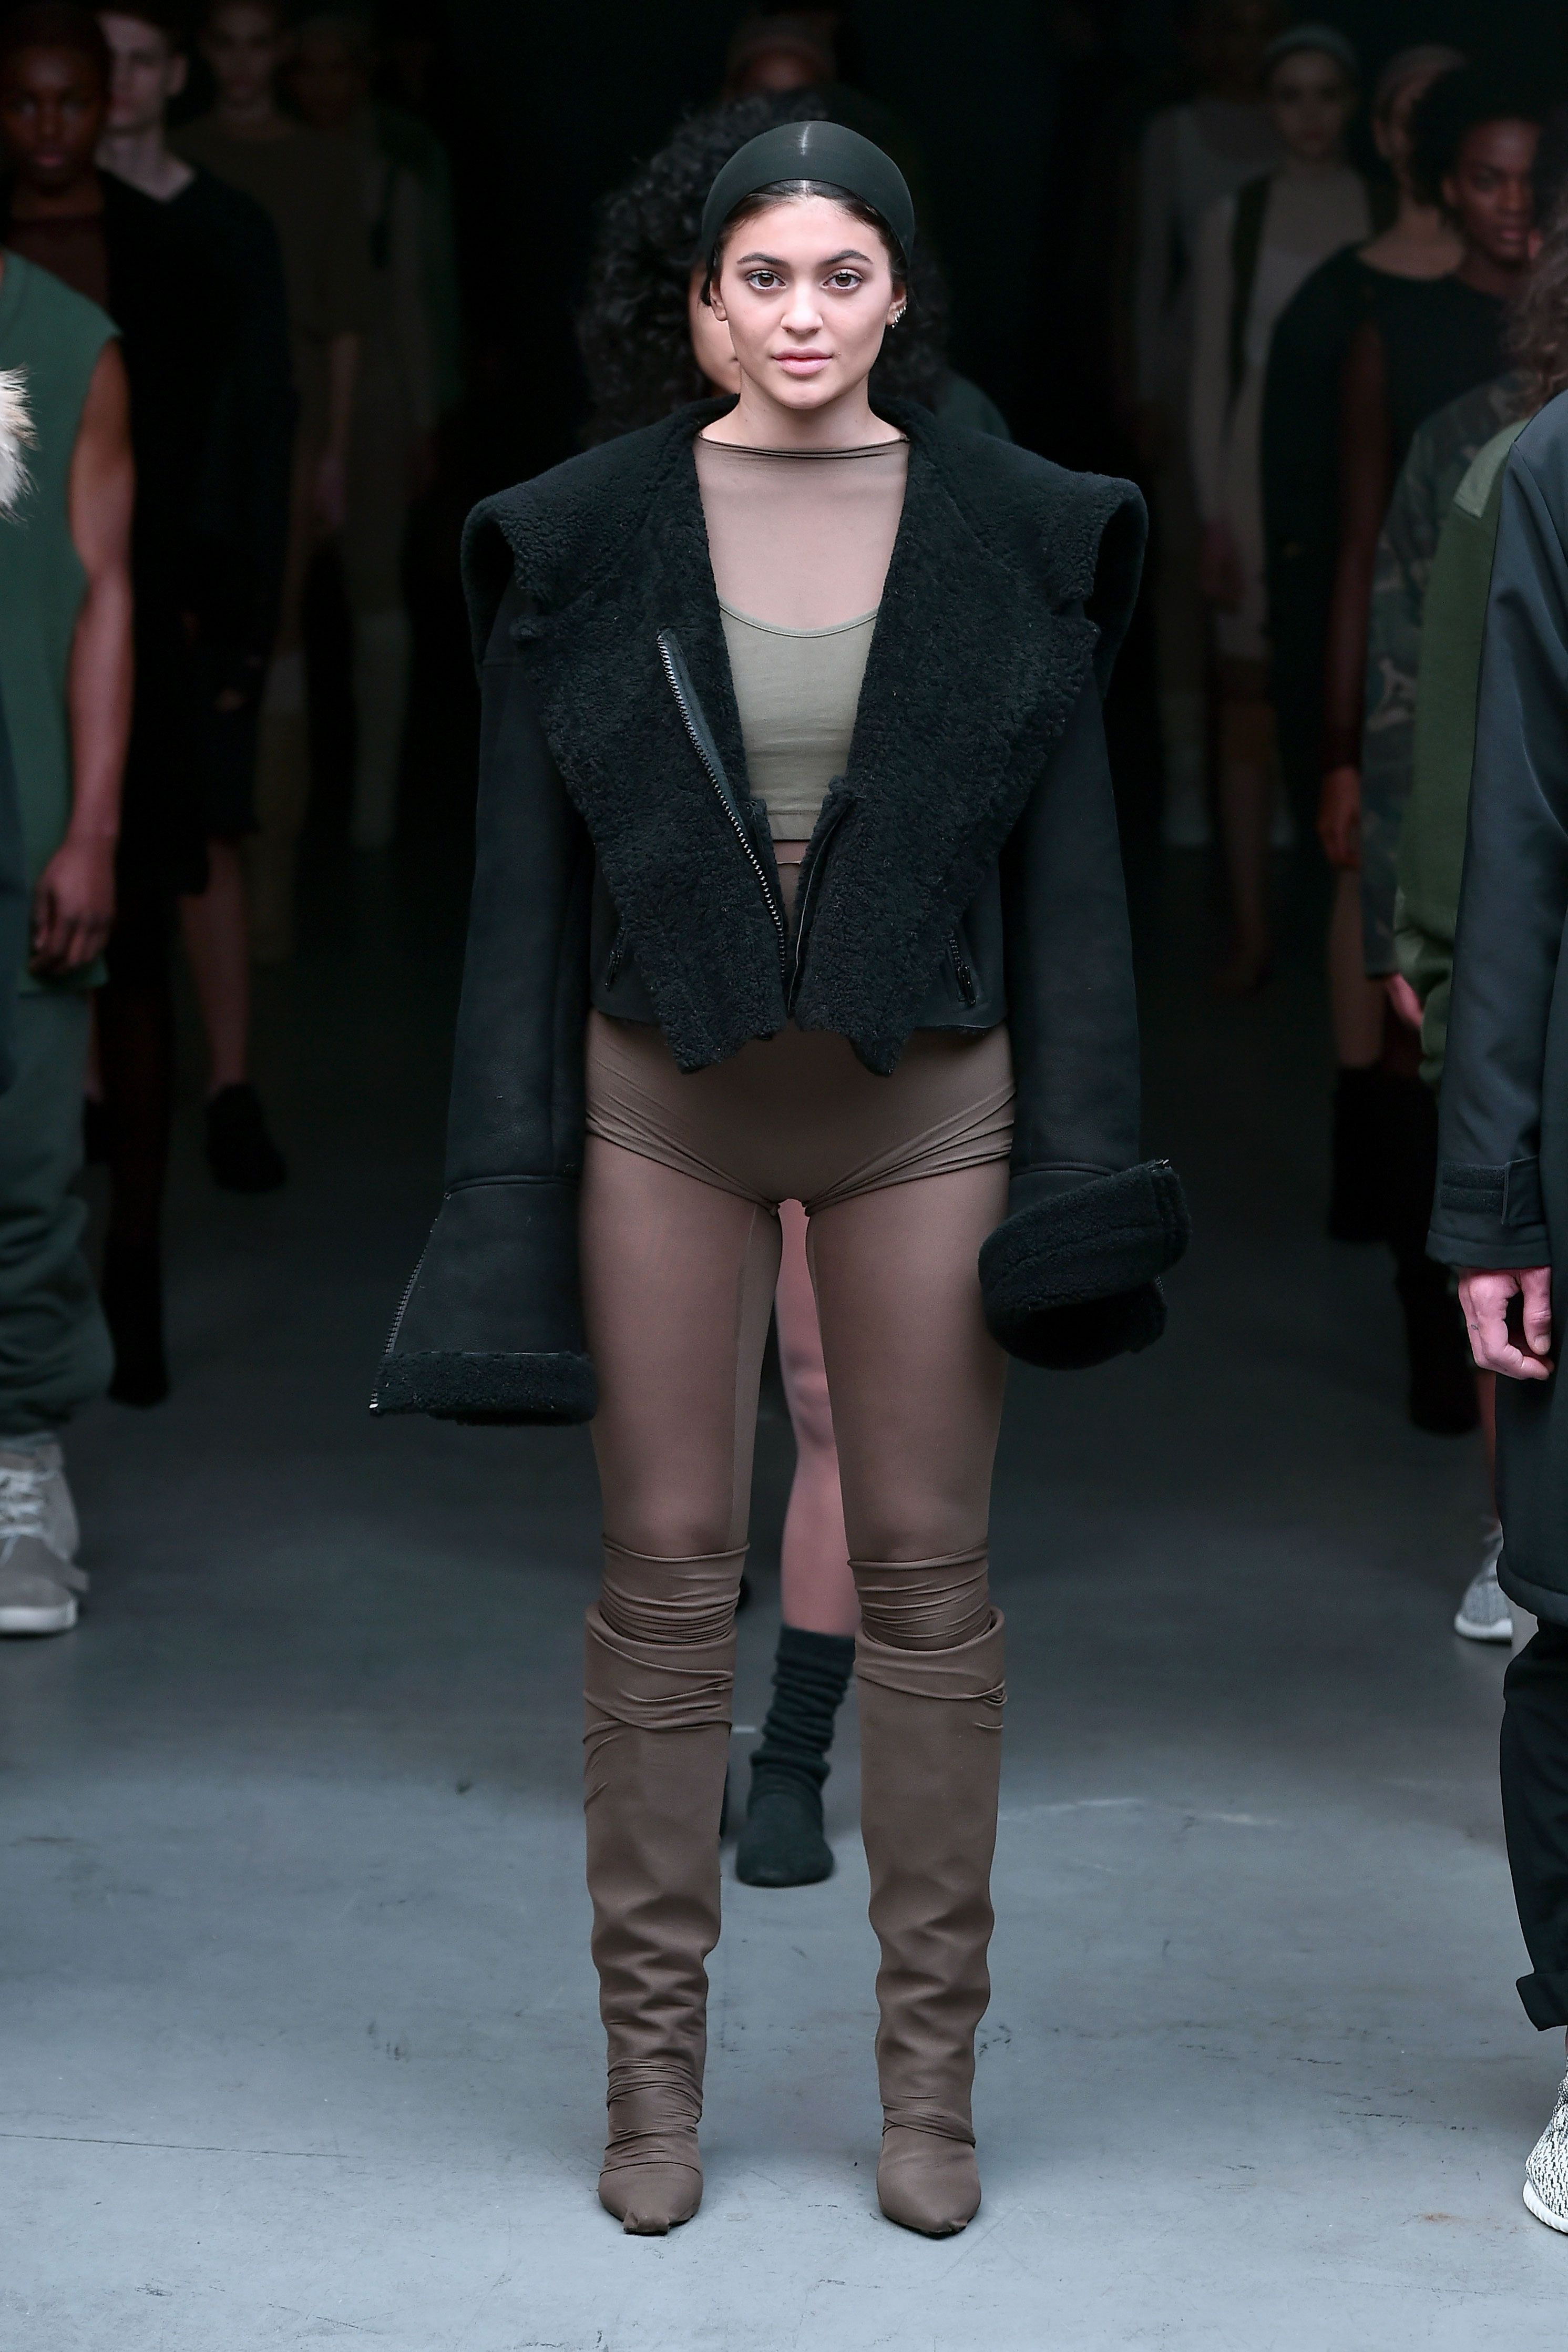 Celebrities Doing Things Yeezy Fashion Show Fashion Ny Fashion Week